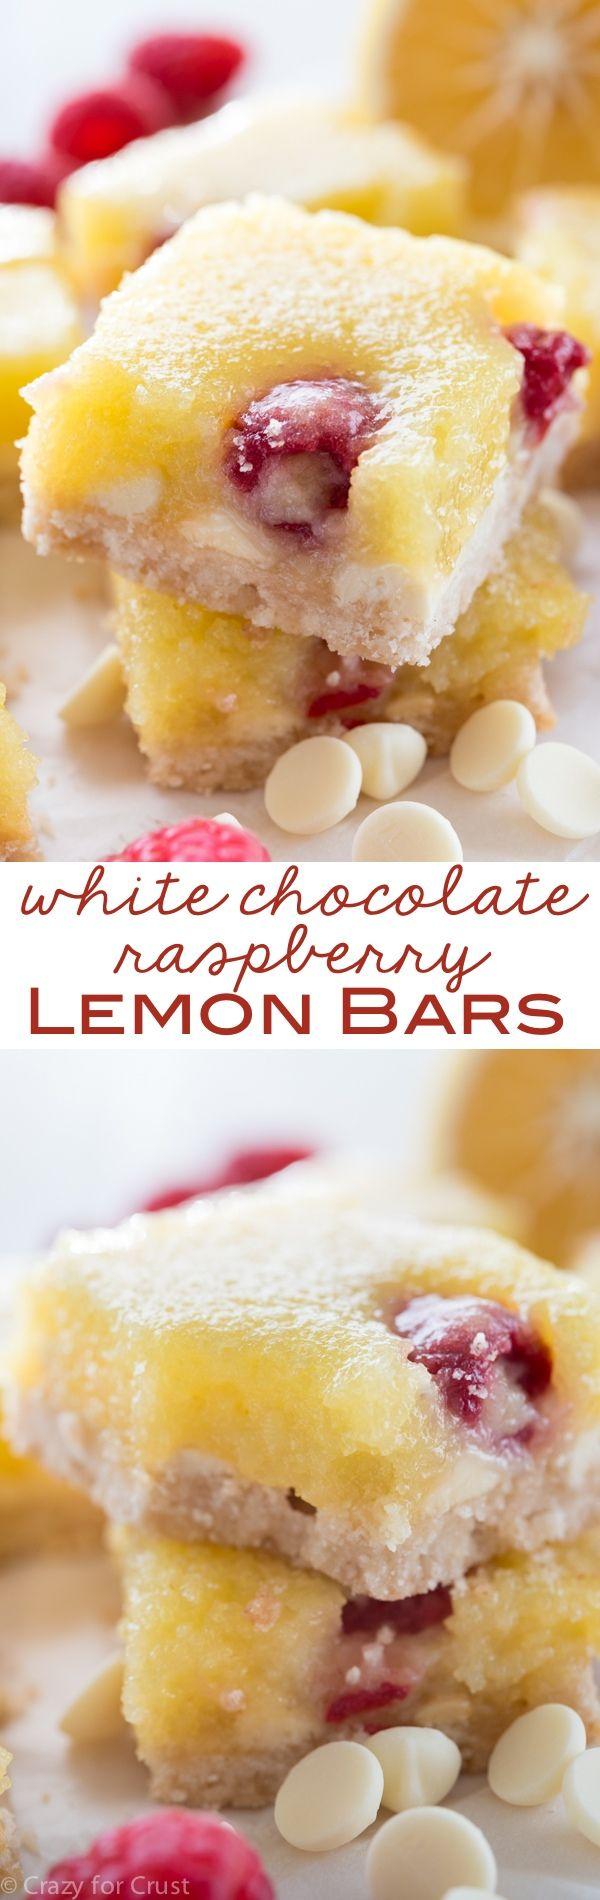 White Chocolate Rasberry Lemon Bars - add flavor to your favorite lemon bar recipe!